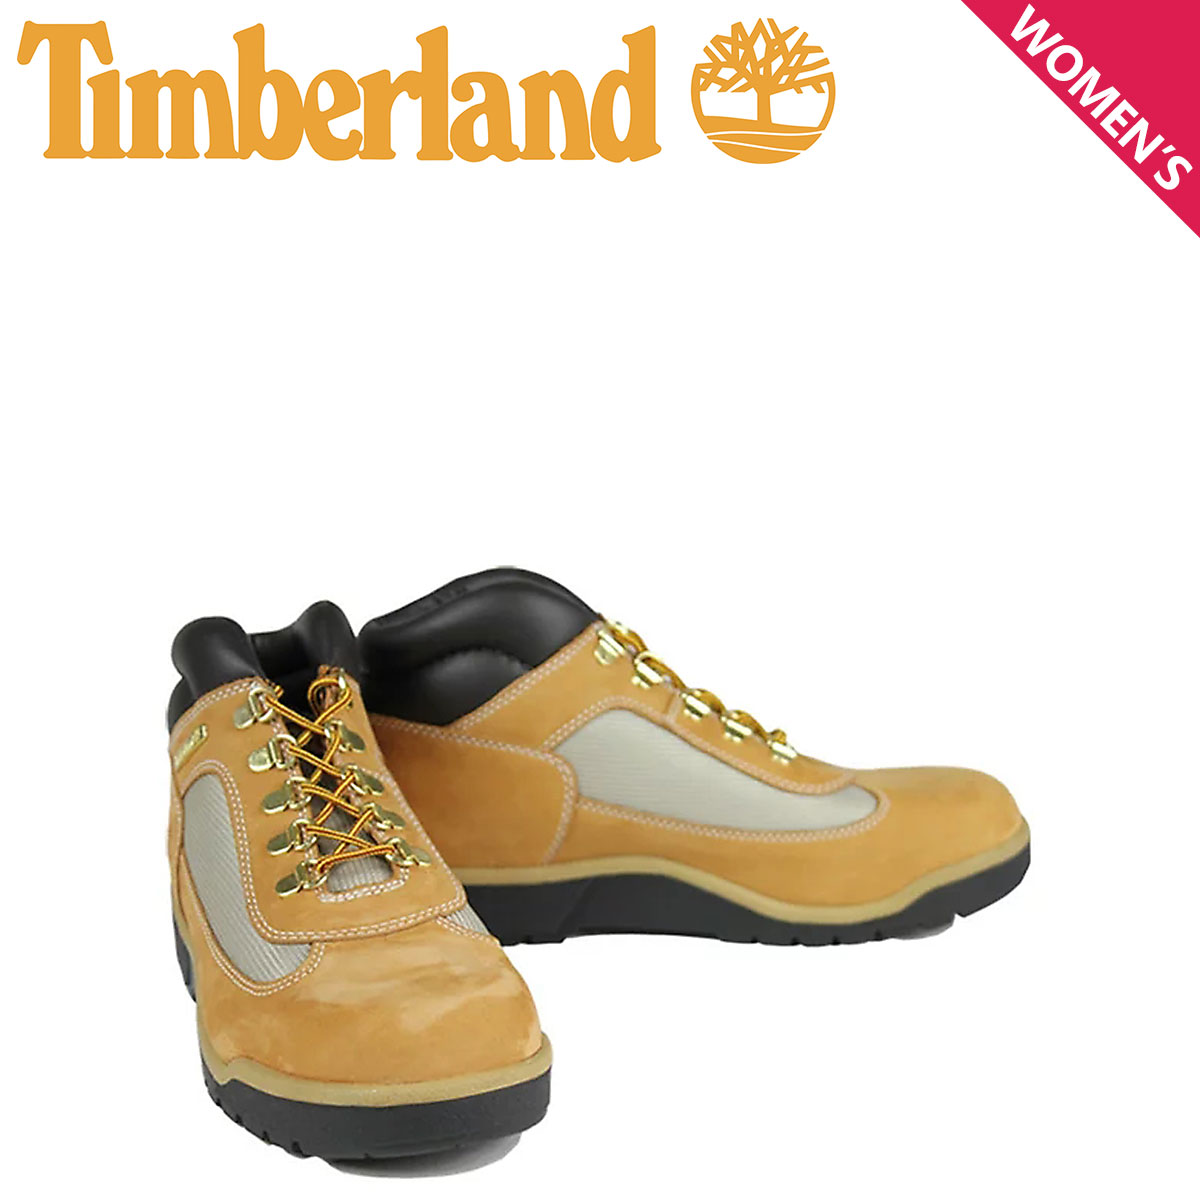 Timberland ティンバーランド ブーツ レディース JUNIOR FIELD BOOT 15945 防水